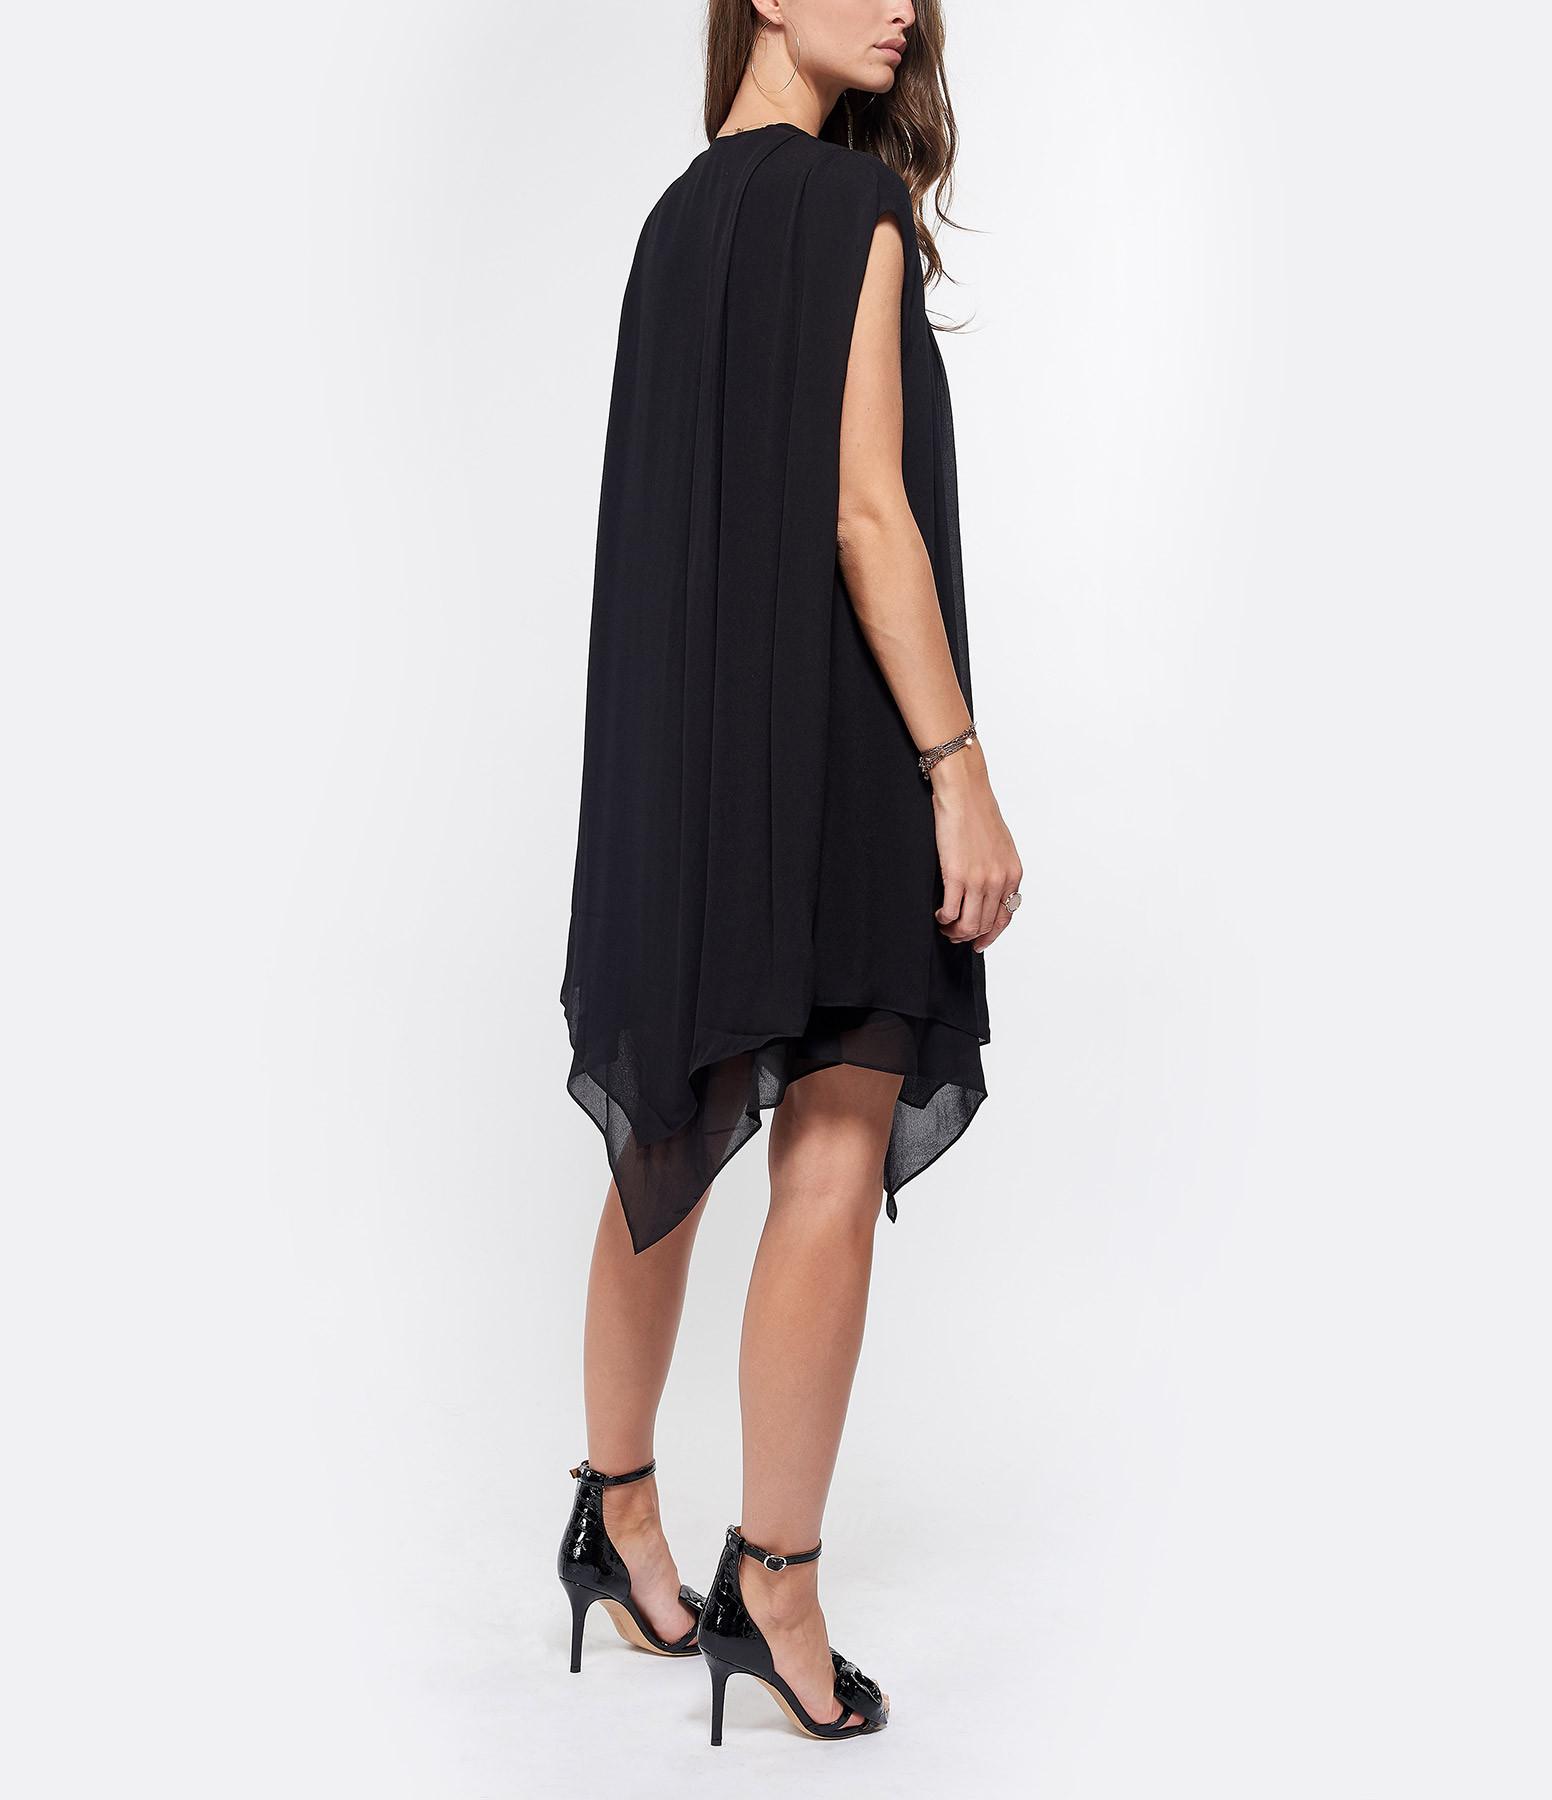 IRO - Robe Desvio Noir